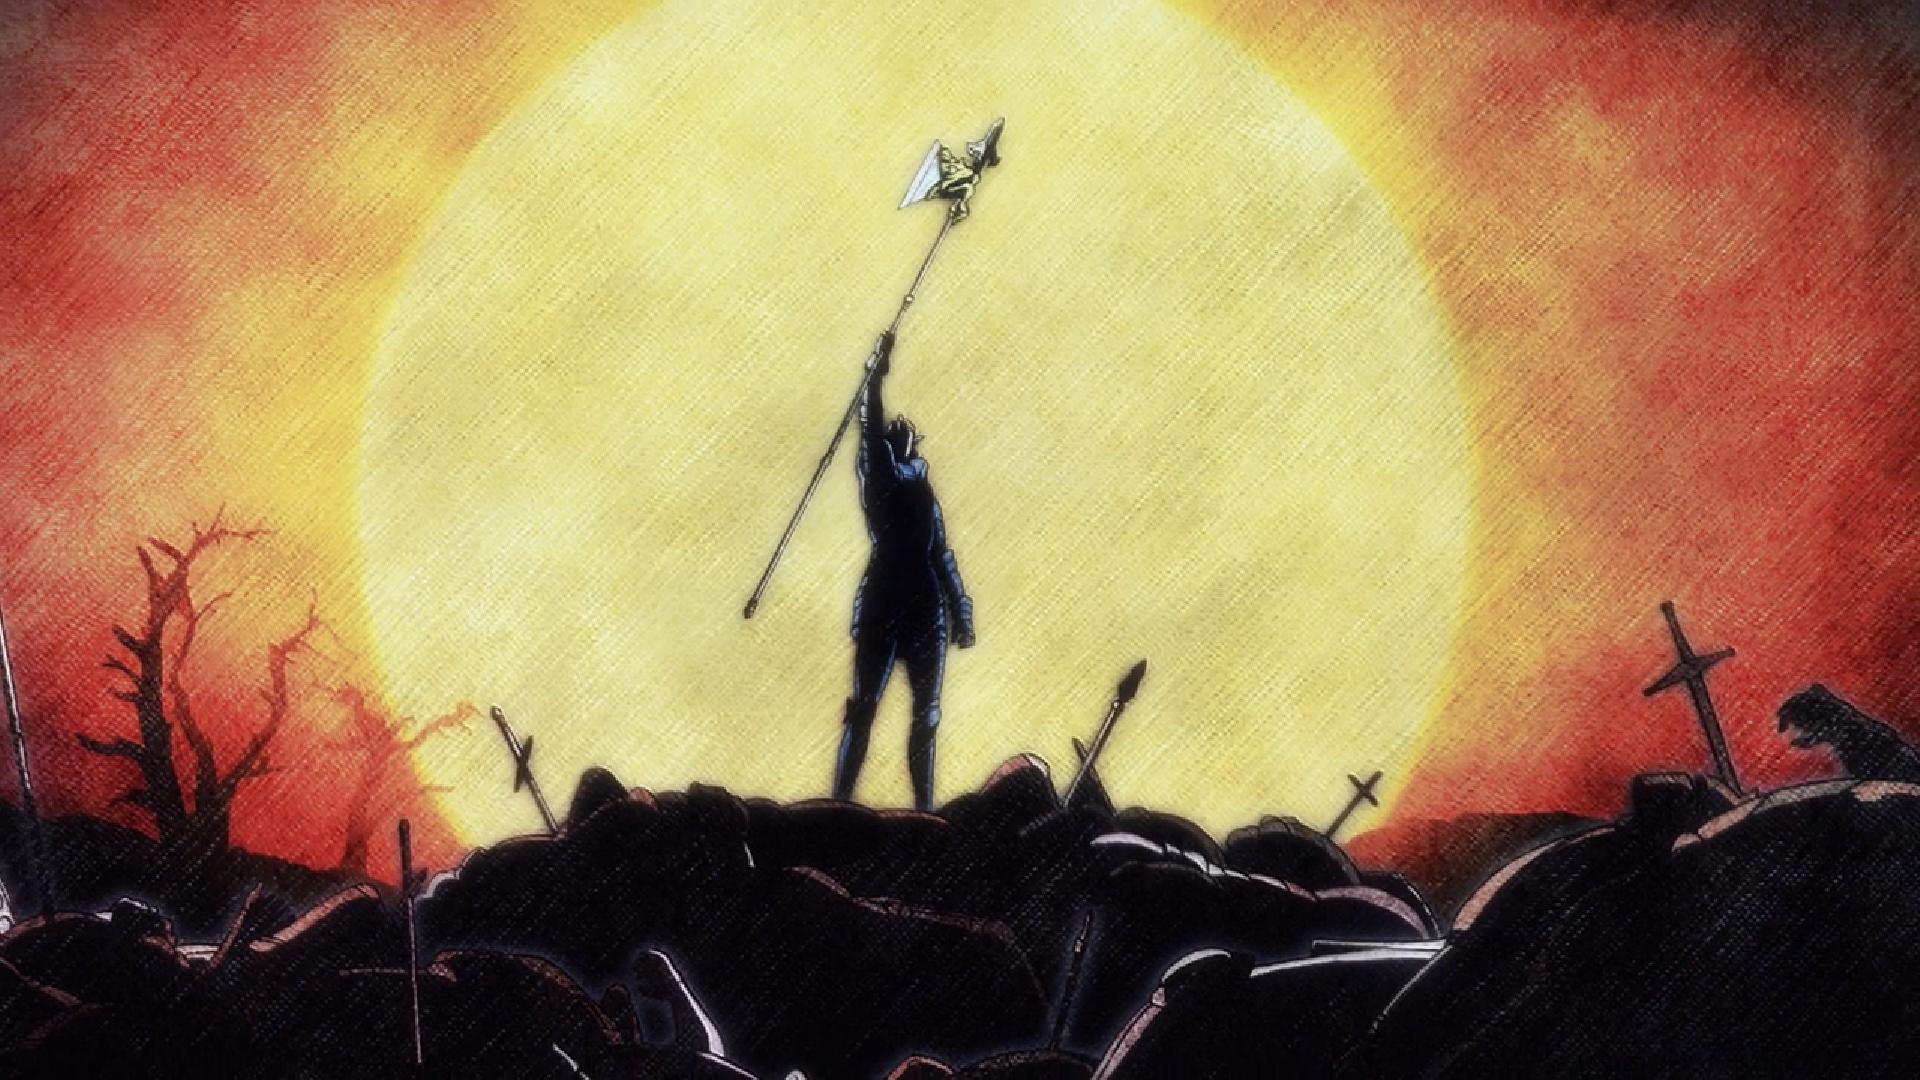 Virtual Haven - Sword Gai The Animation Episode 9 Thumbnail Image.png